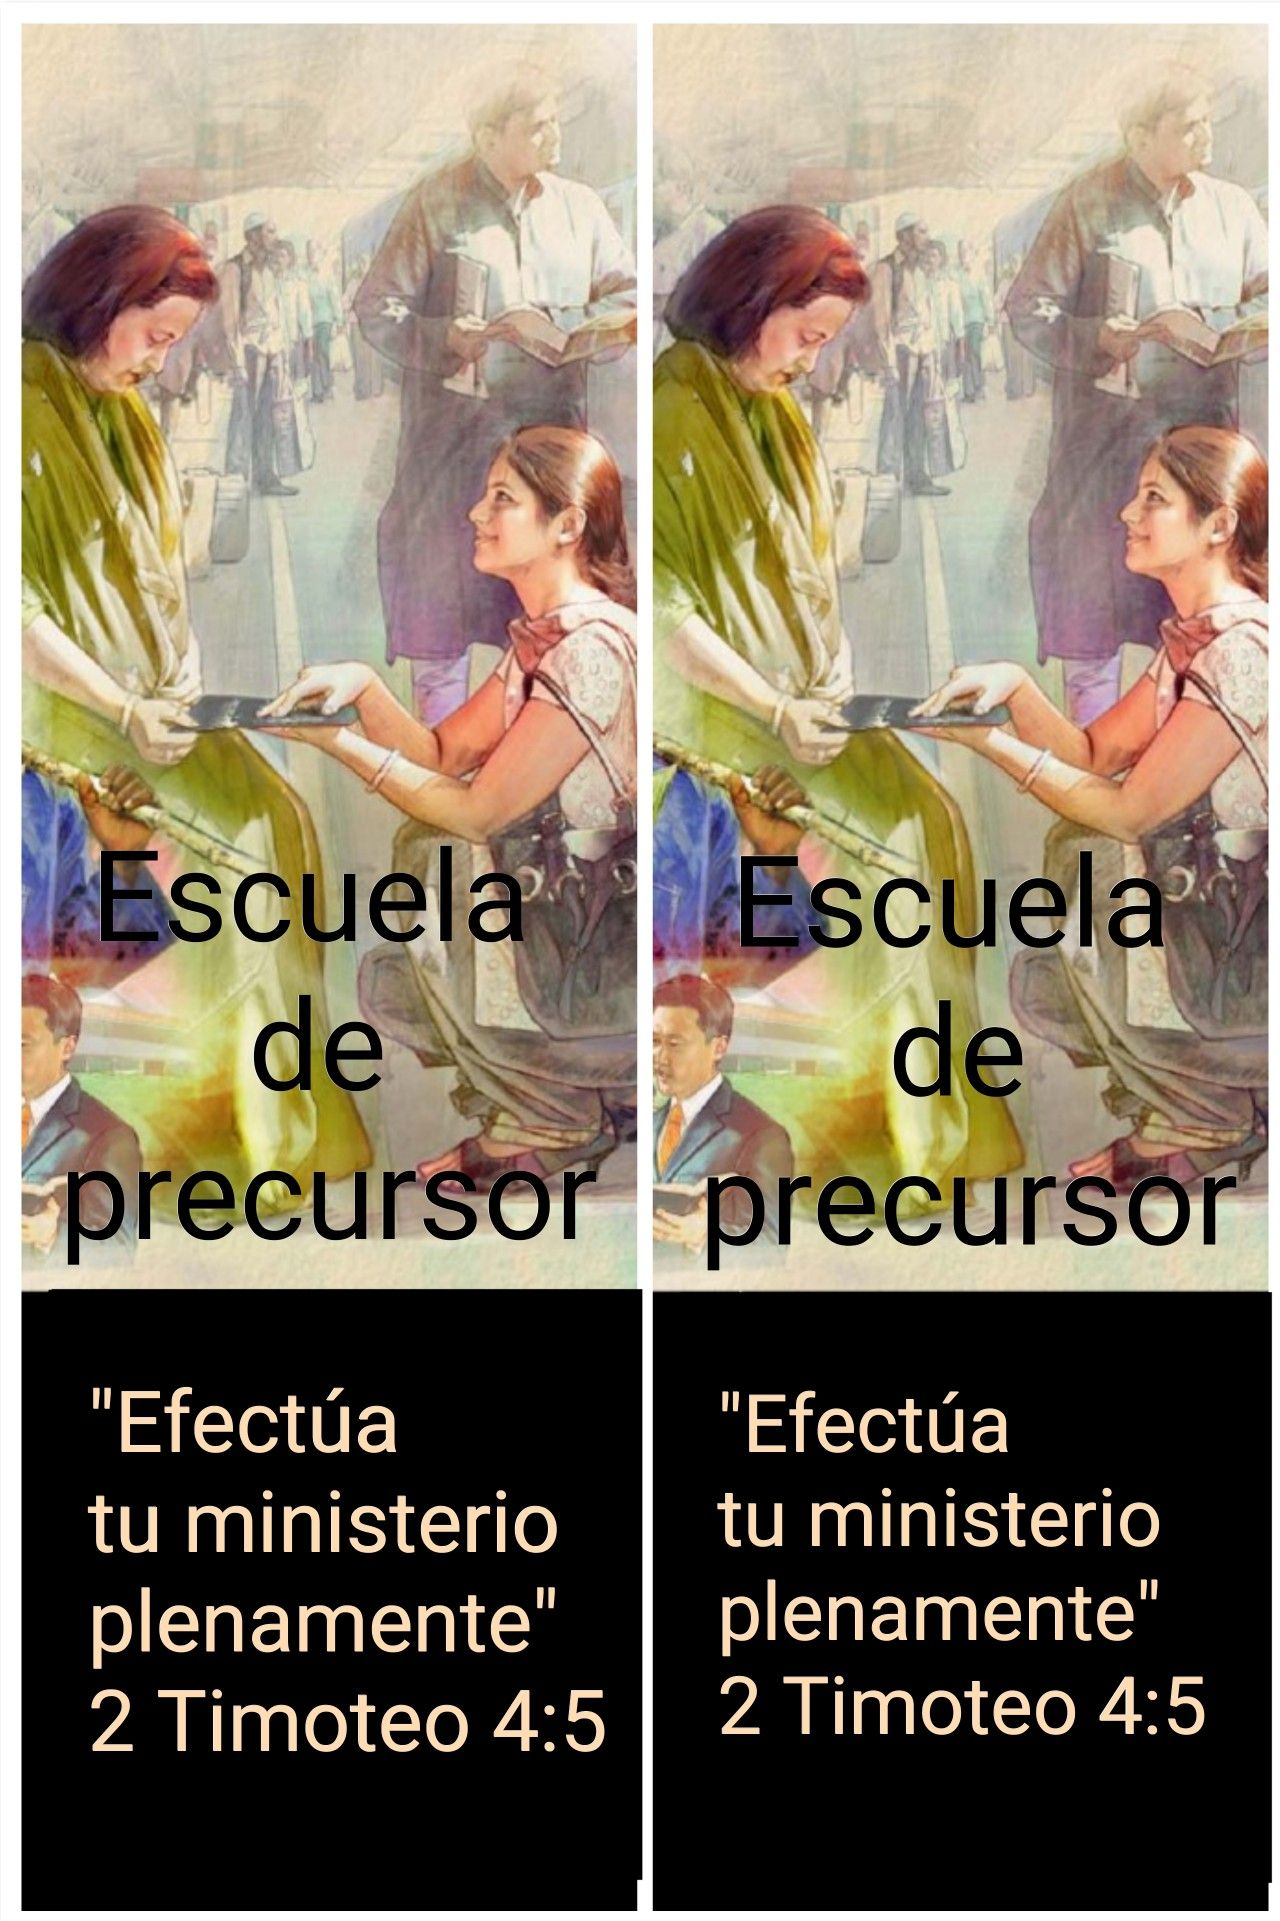 Pin By Bárbara Silva On Jw Que Regalar A Un Testigo De Jehova Jehovah S Witnesses Pioneer School Gifts Pioneer Gifts Pioneer School